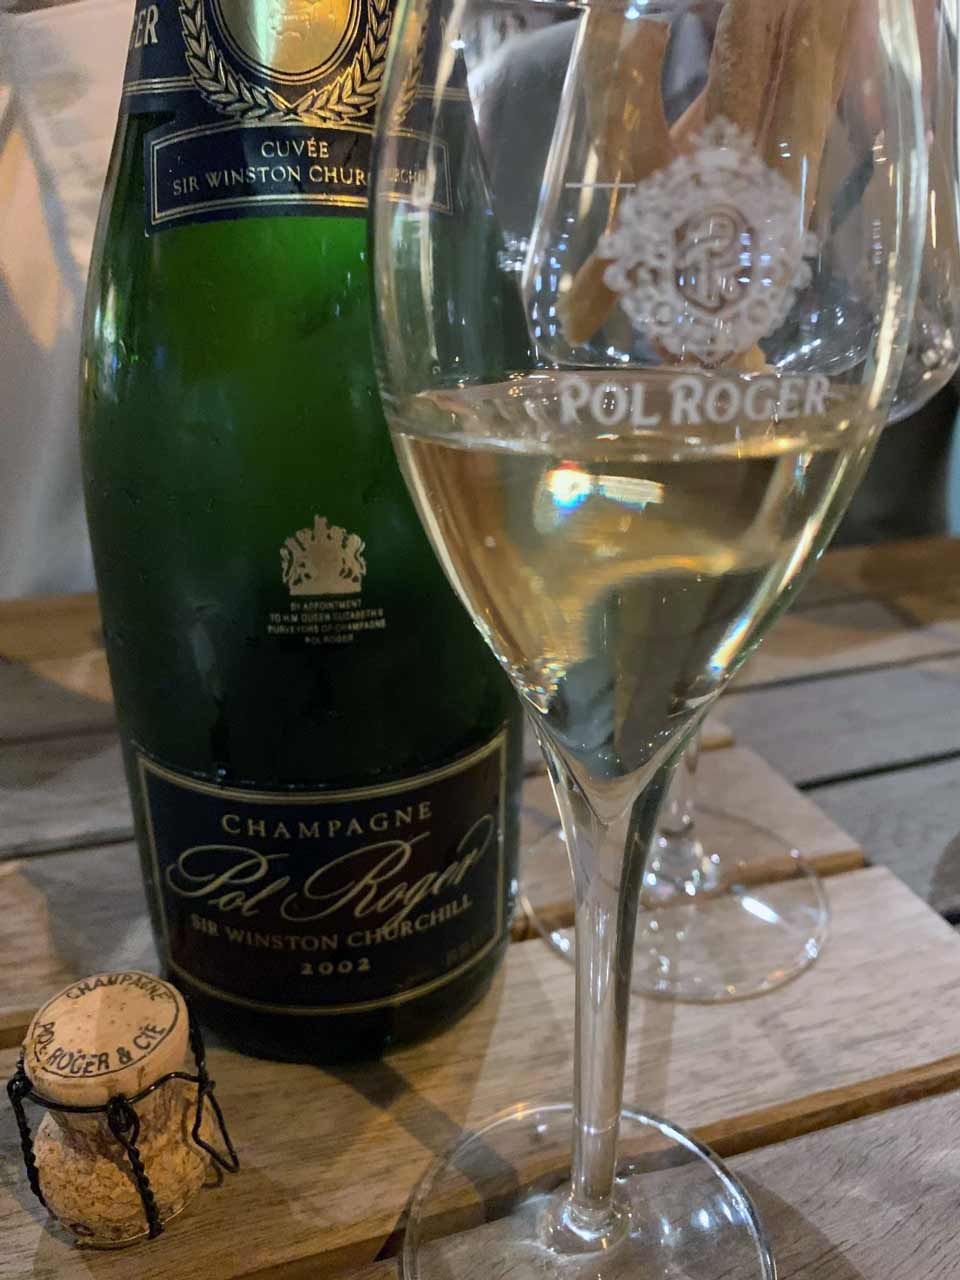 2002 Champagne Pol Roger Cuvée Sir Winston Churchill